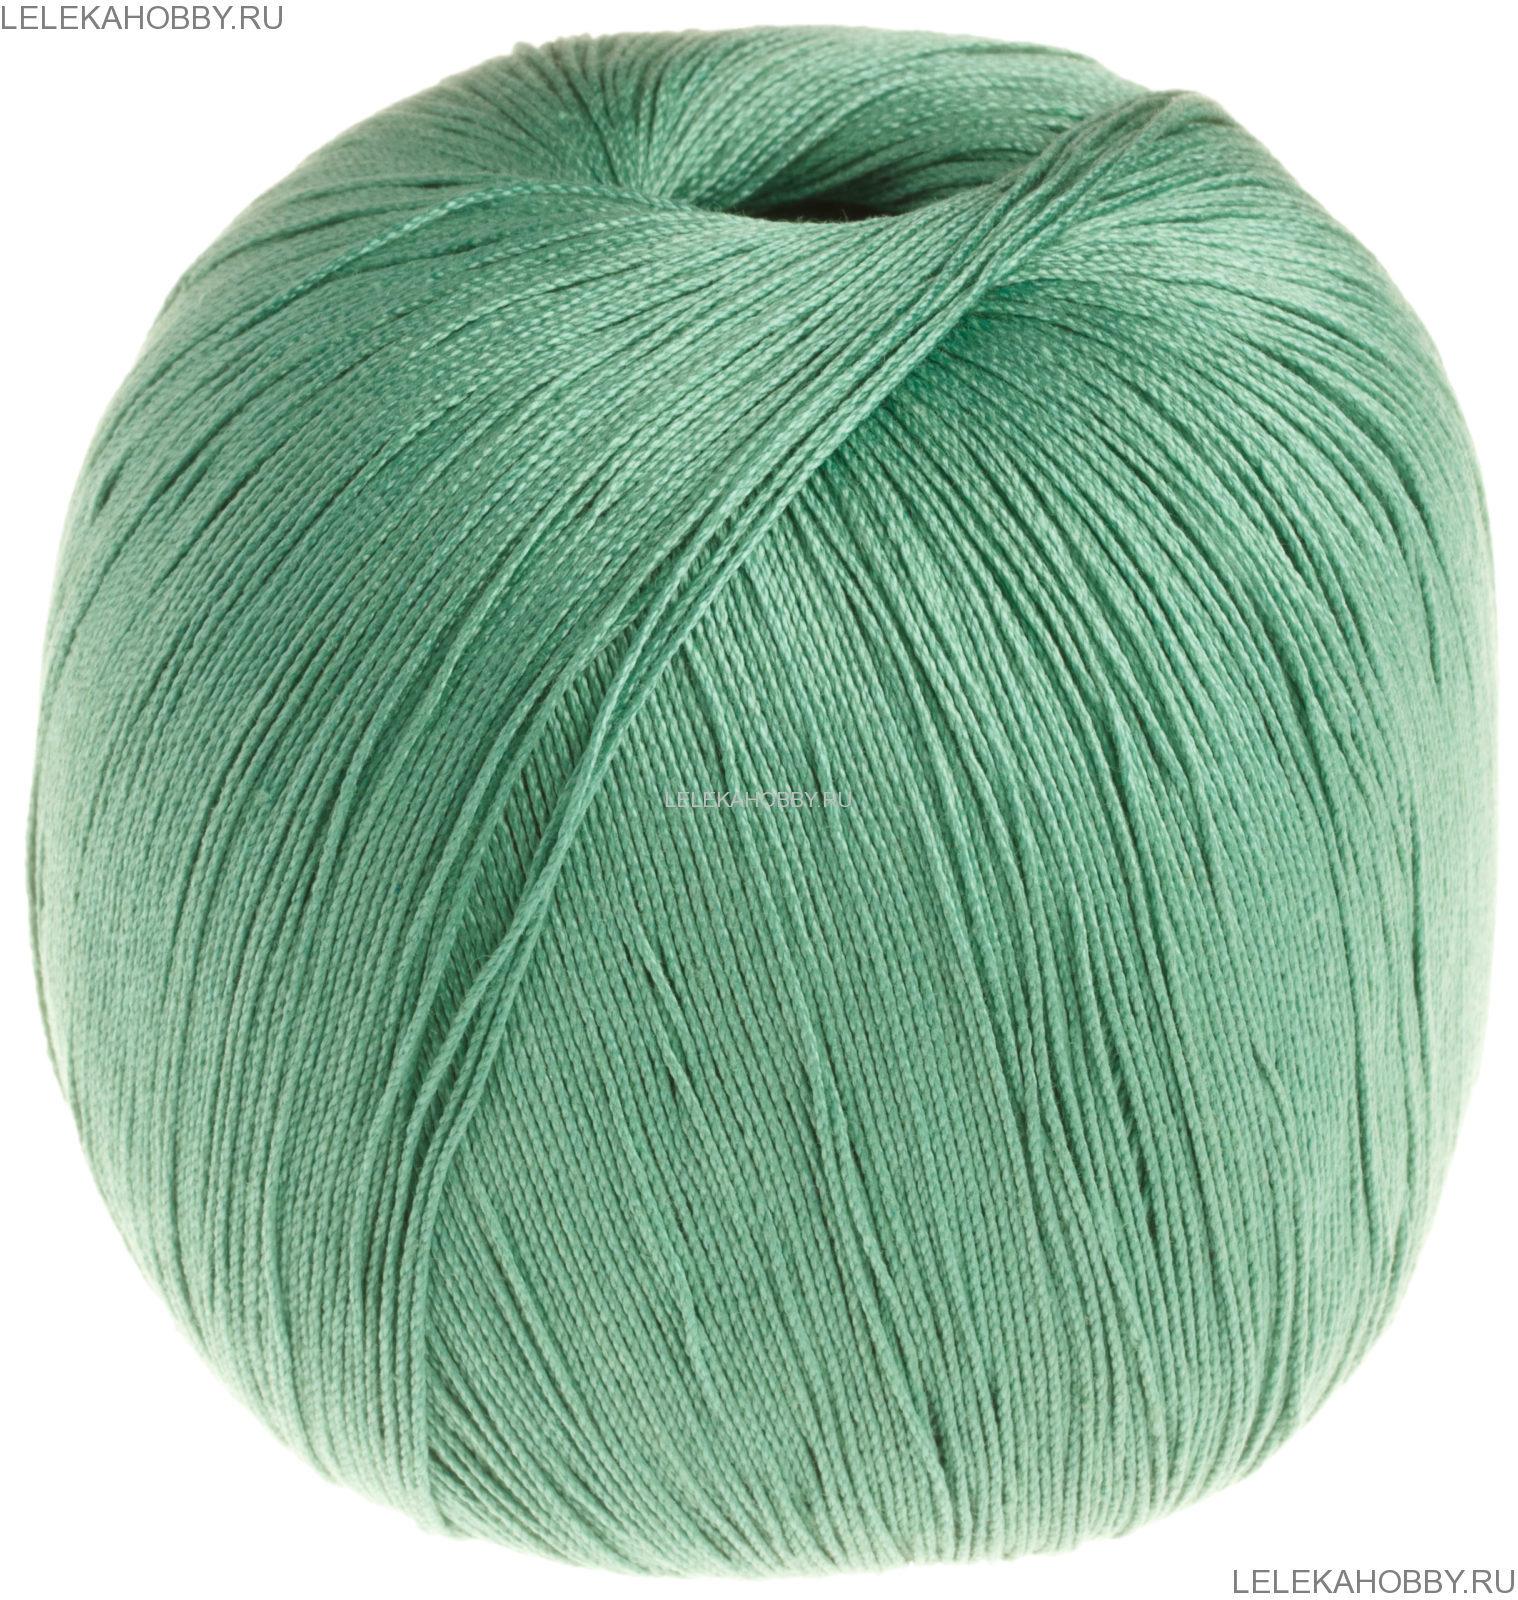 Пряжа для вязания кружев